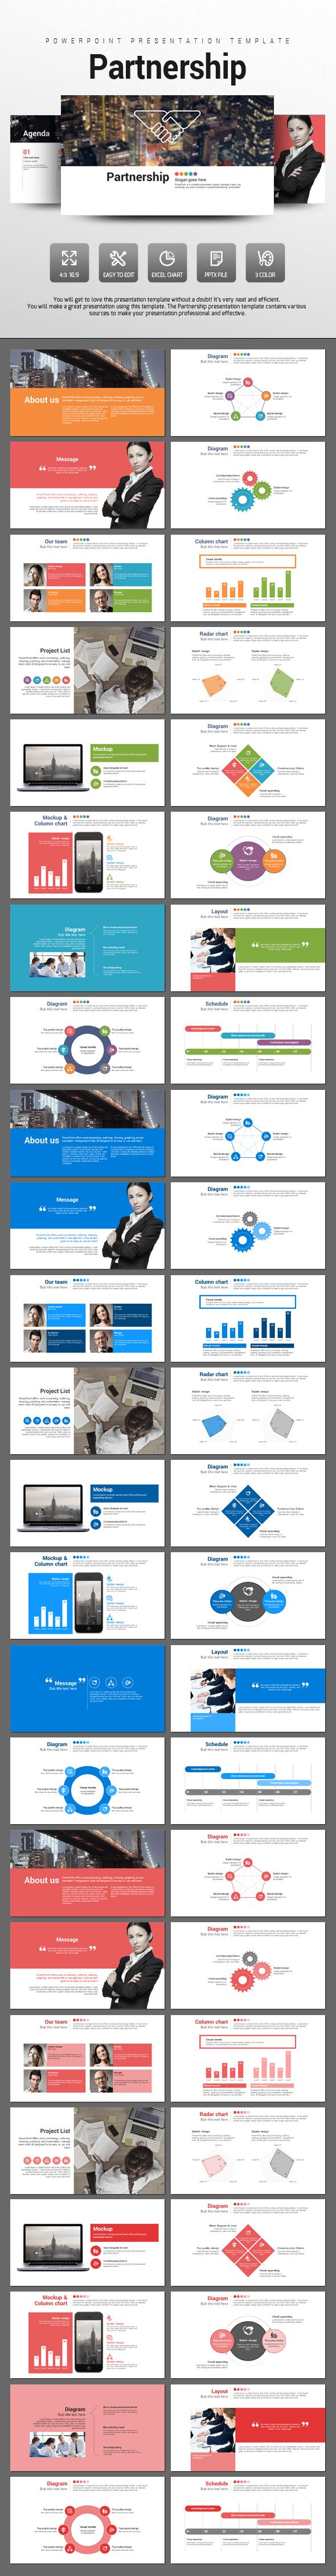 Partnership - PowerPoint Templates Presentation Templates